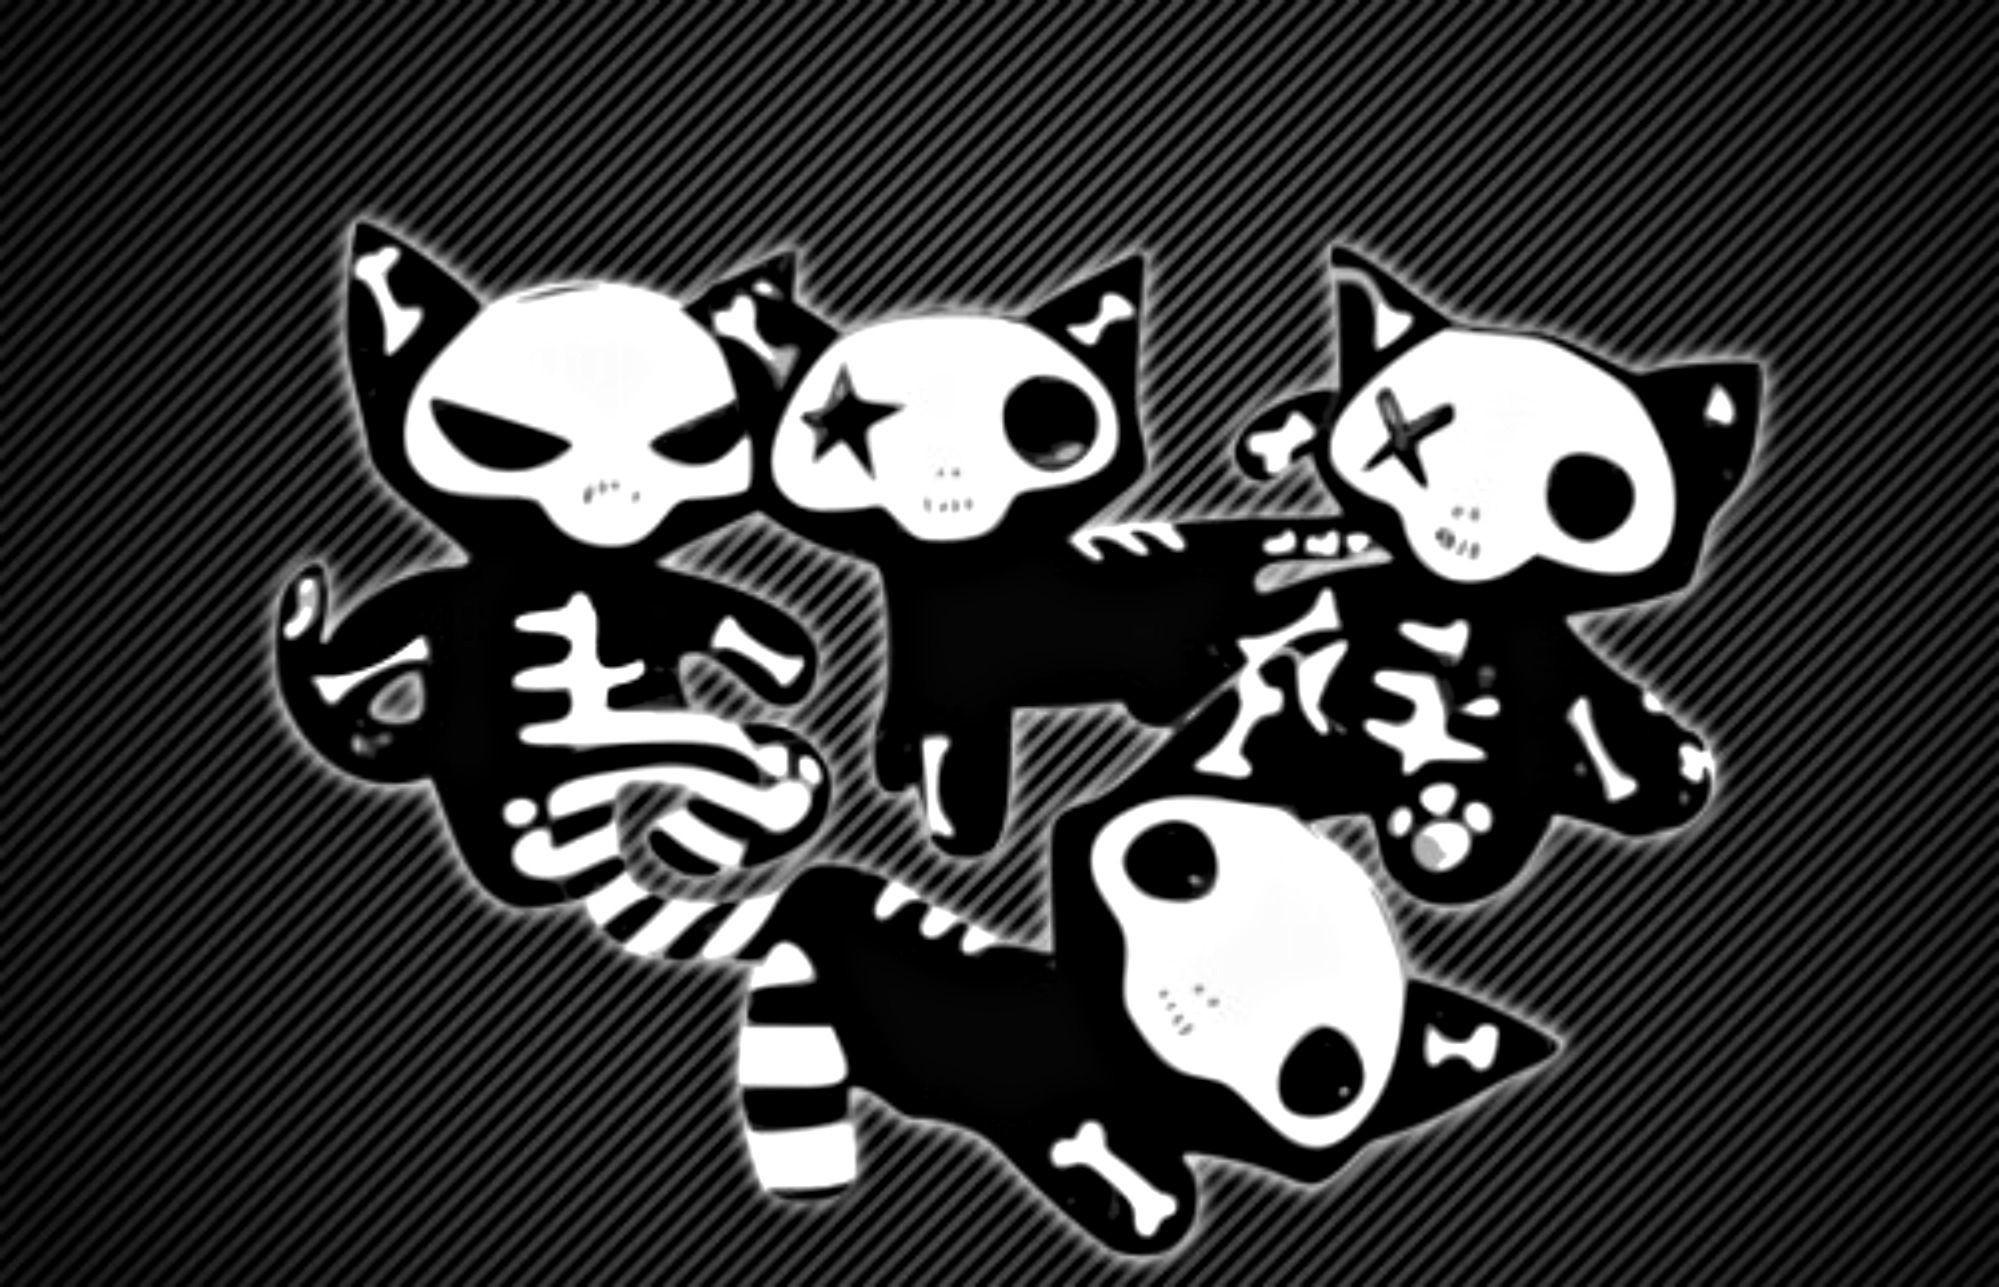 Photo Collection Black Emo Wallpaper Tumblr 2560x1440